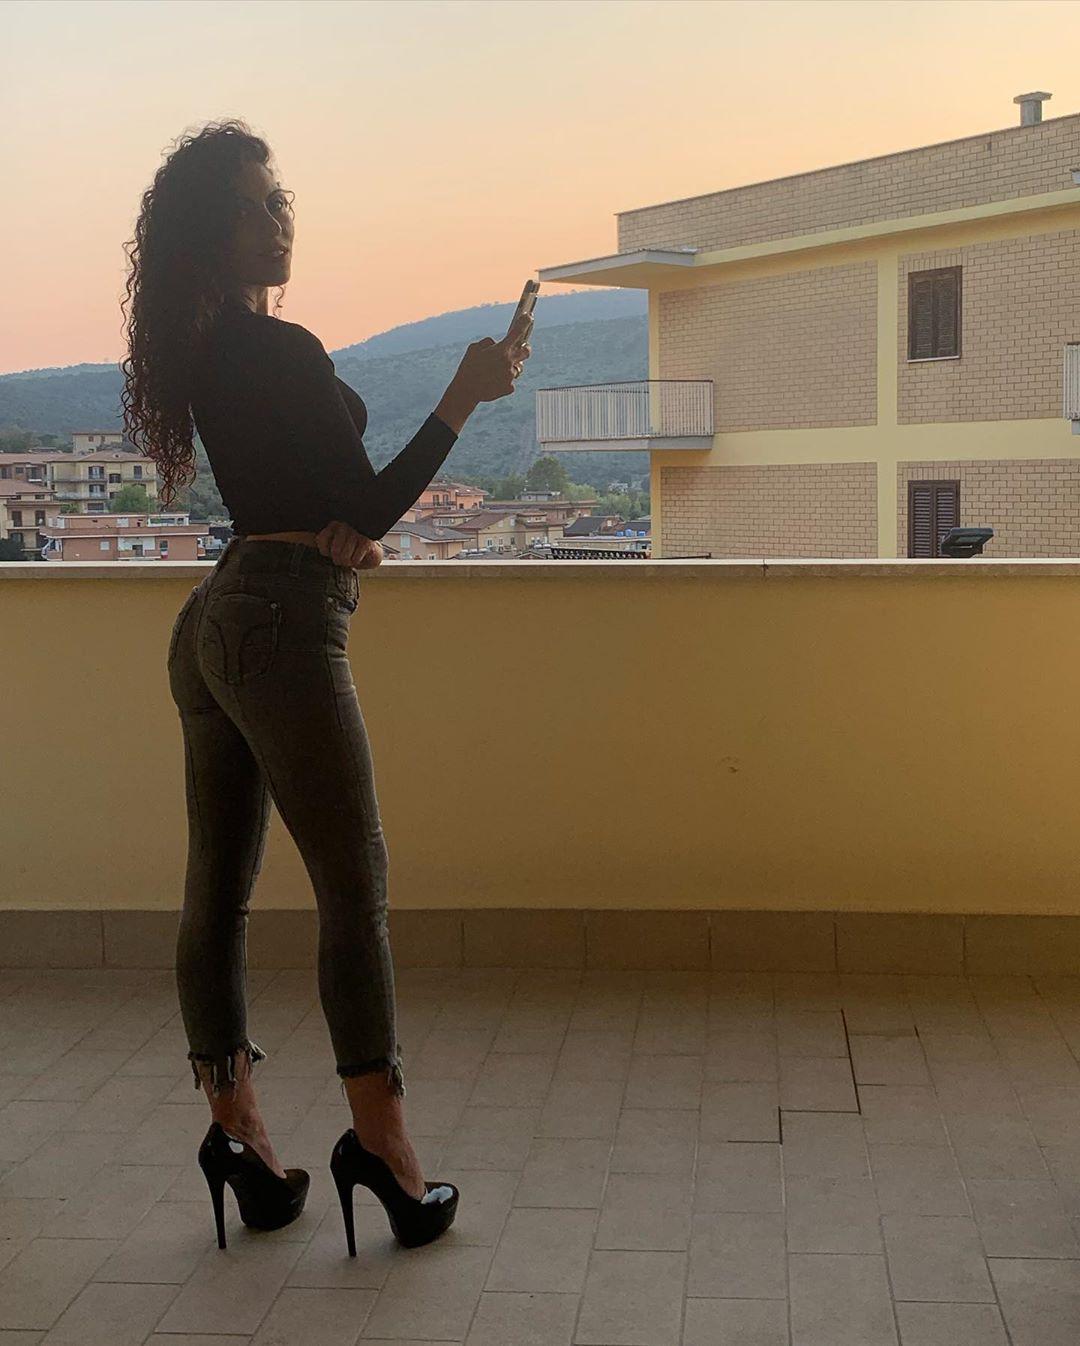 Sara-Quattrociocche-Wallpapers-Insta-Fit-Bio-4